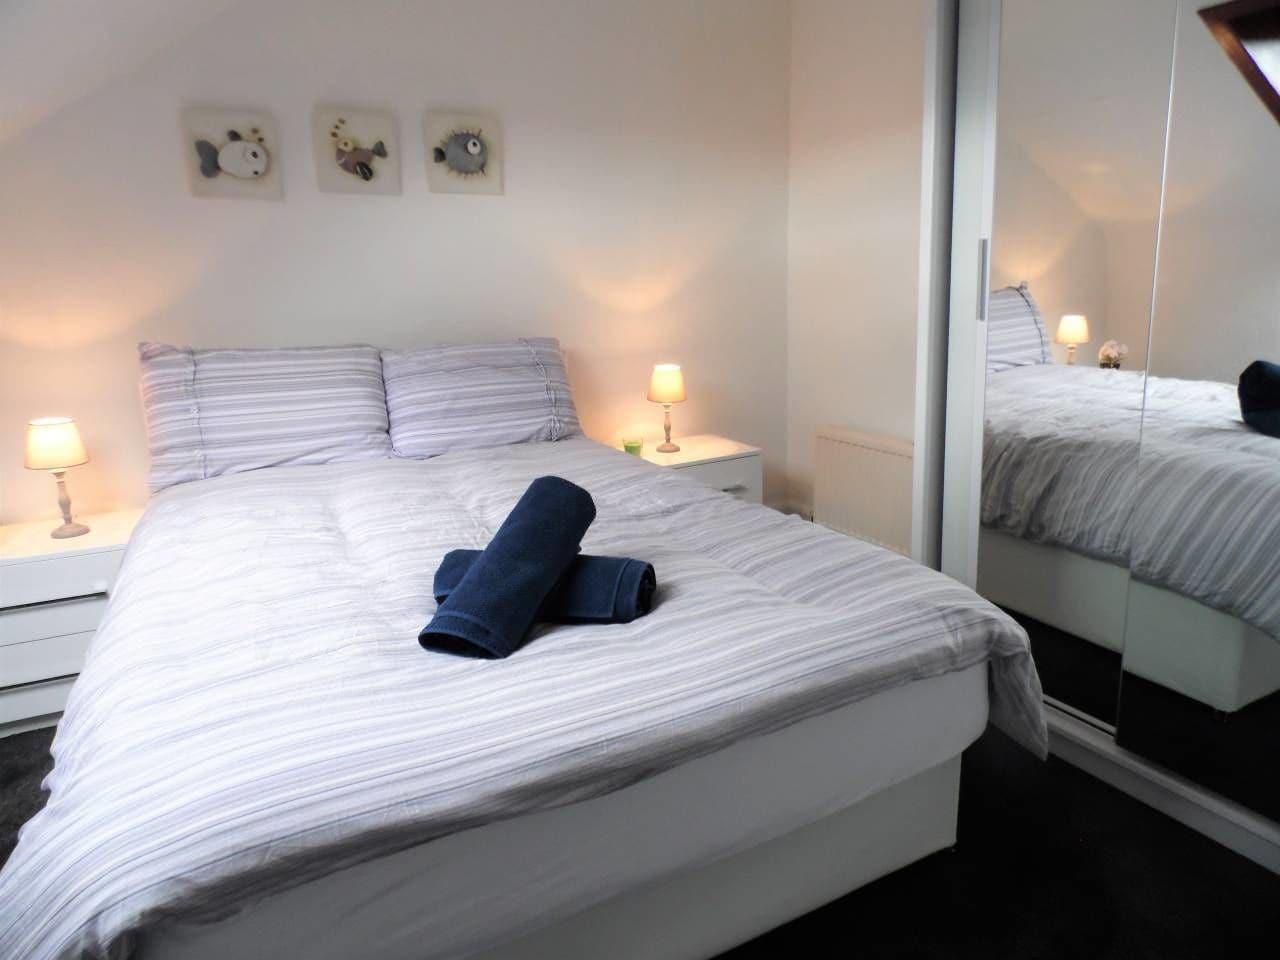 4 Bed Apartment, Paisley - Near GLA Airport, Renfrewshire